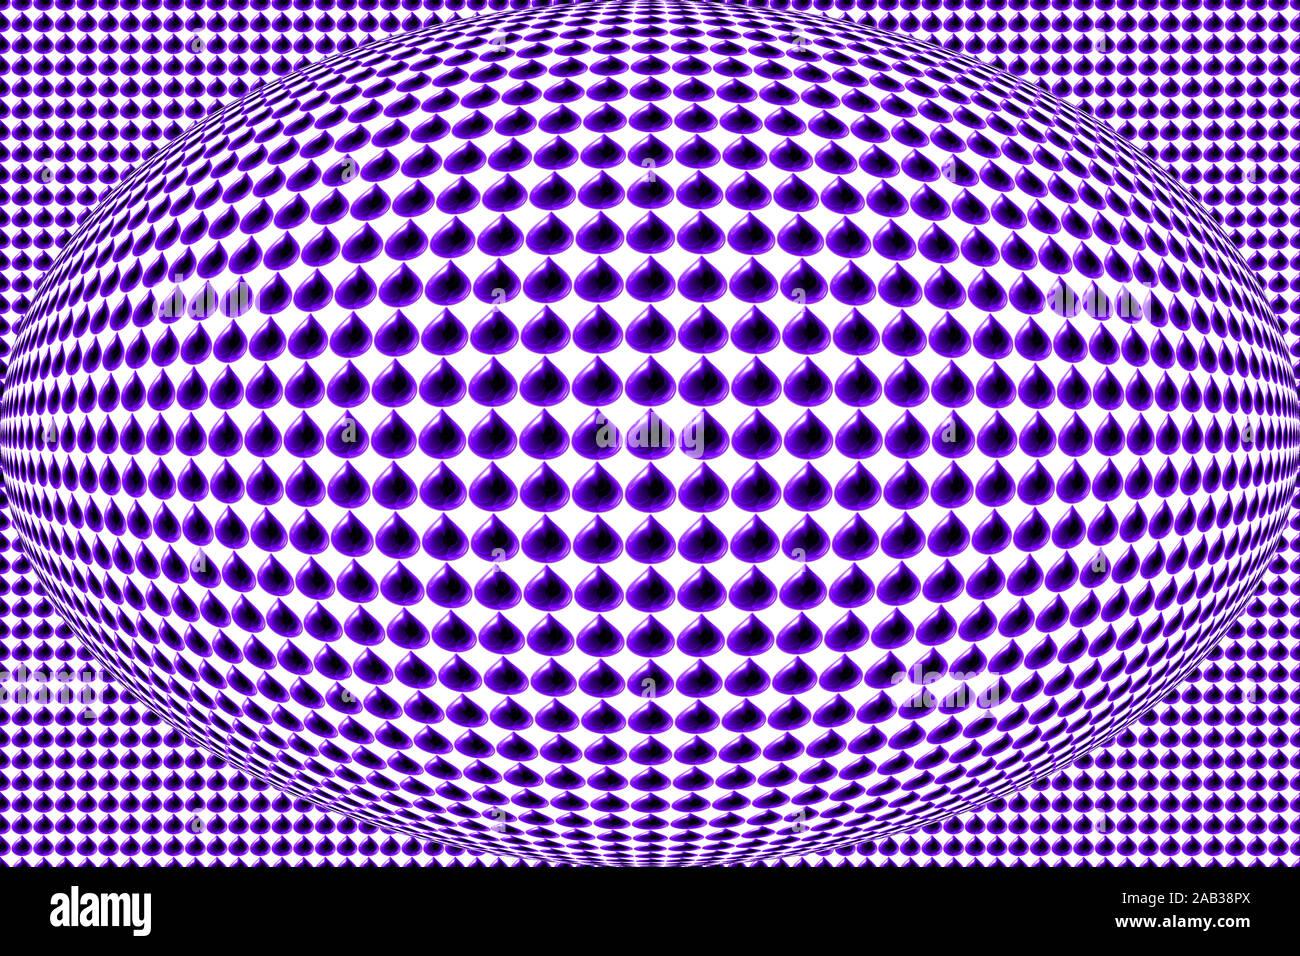 Cruz De Vidrio De Pie-Púrpura y Azul